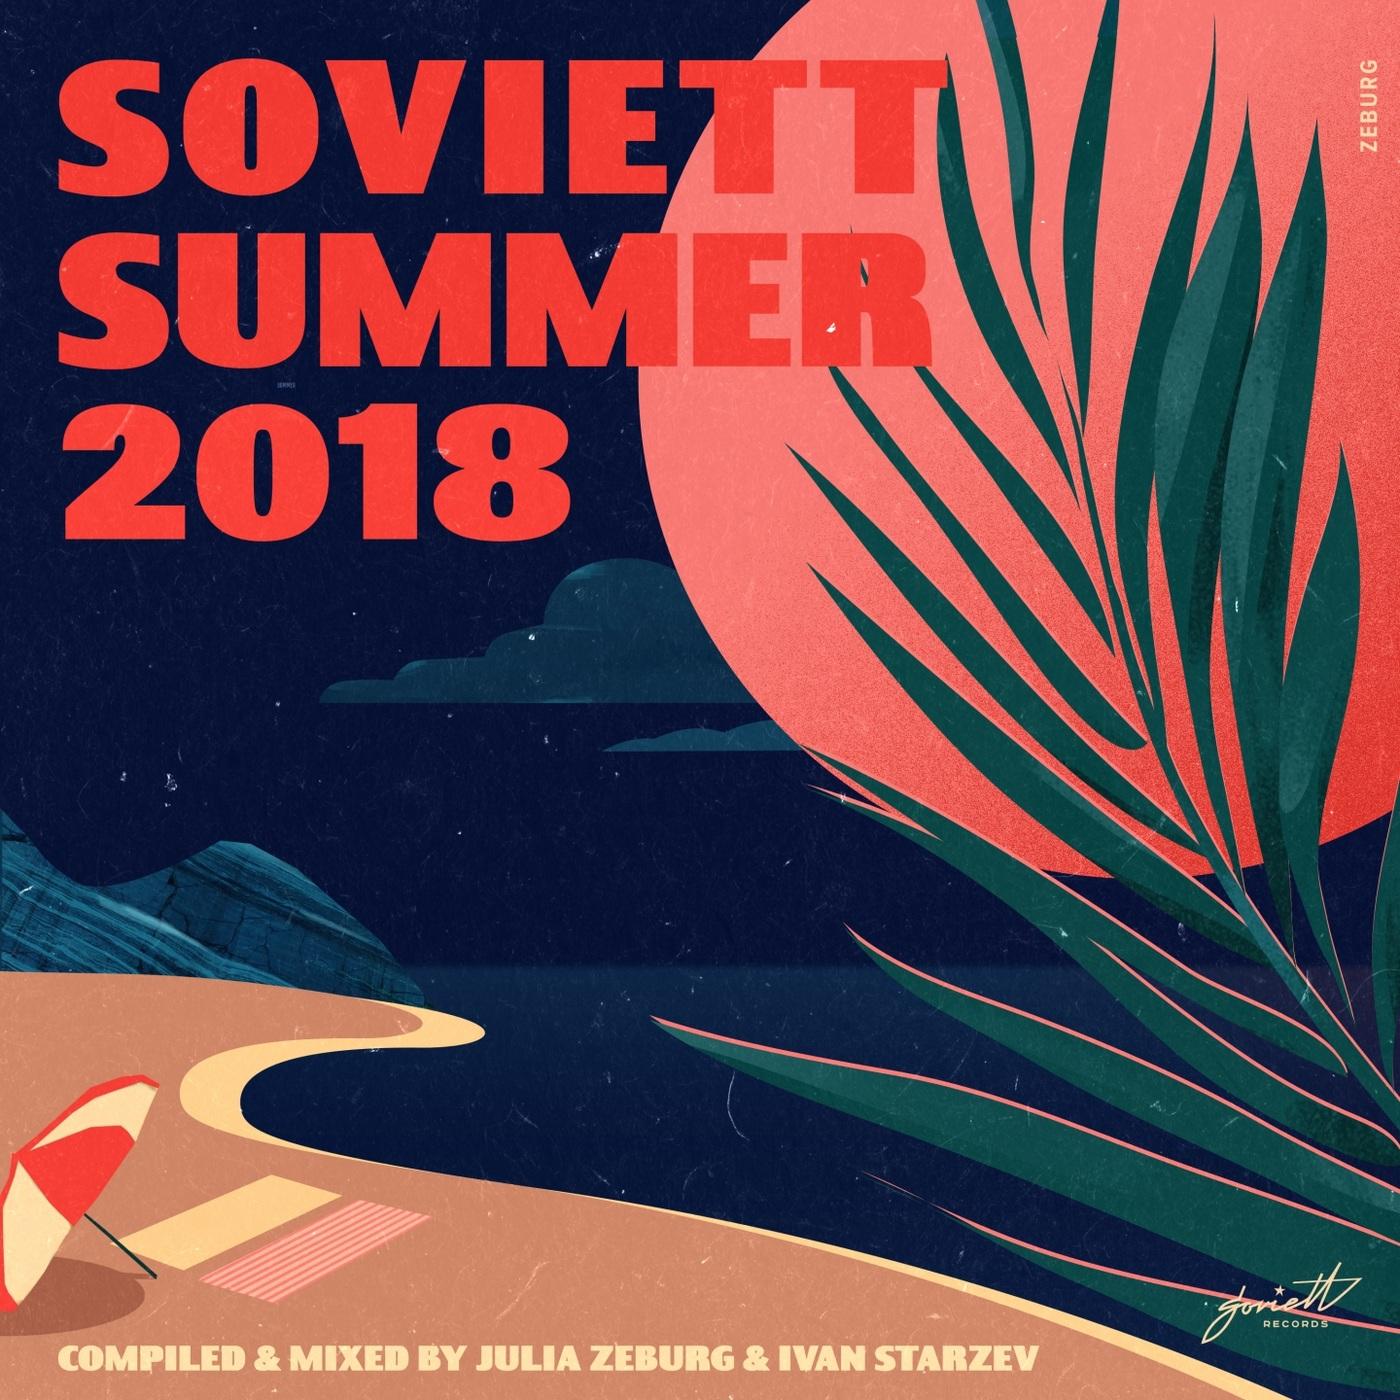 Diskette - The Sand Reckoner (Original Mix)